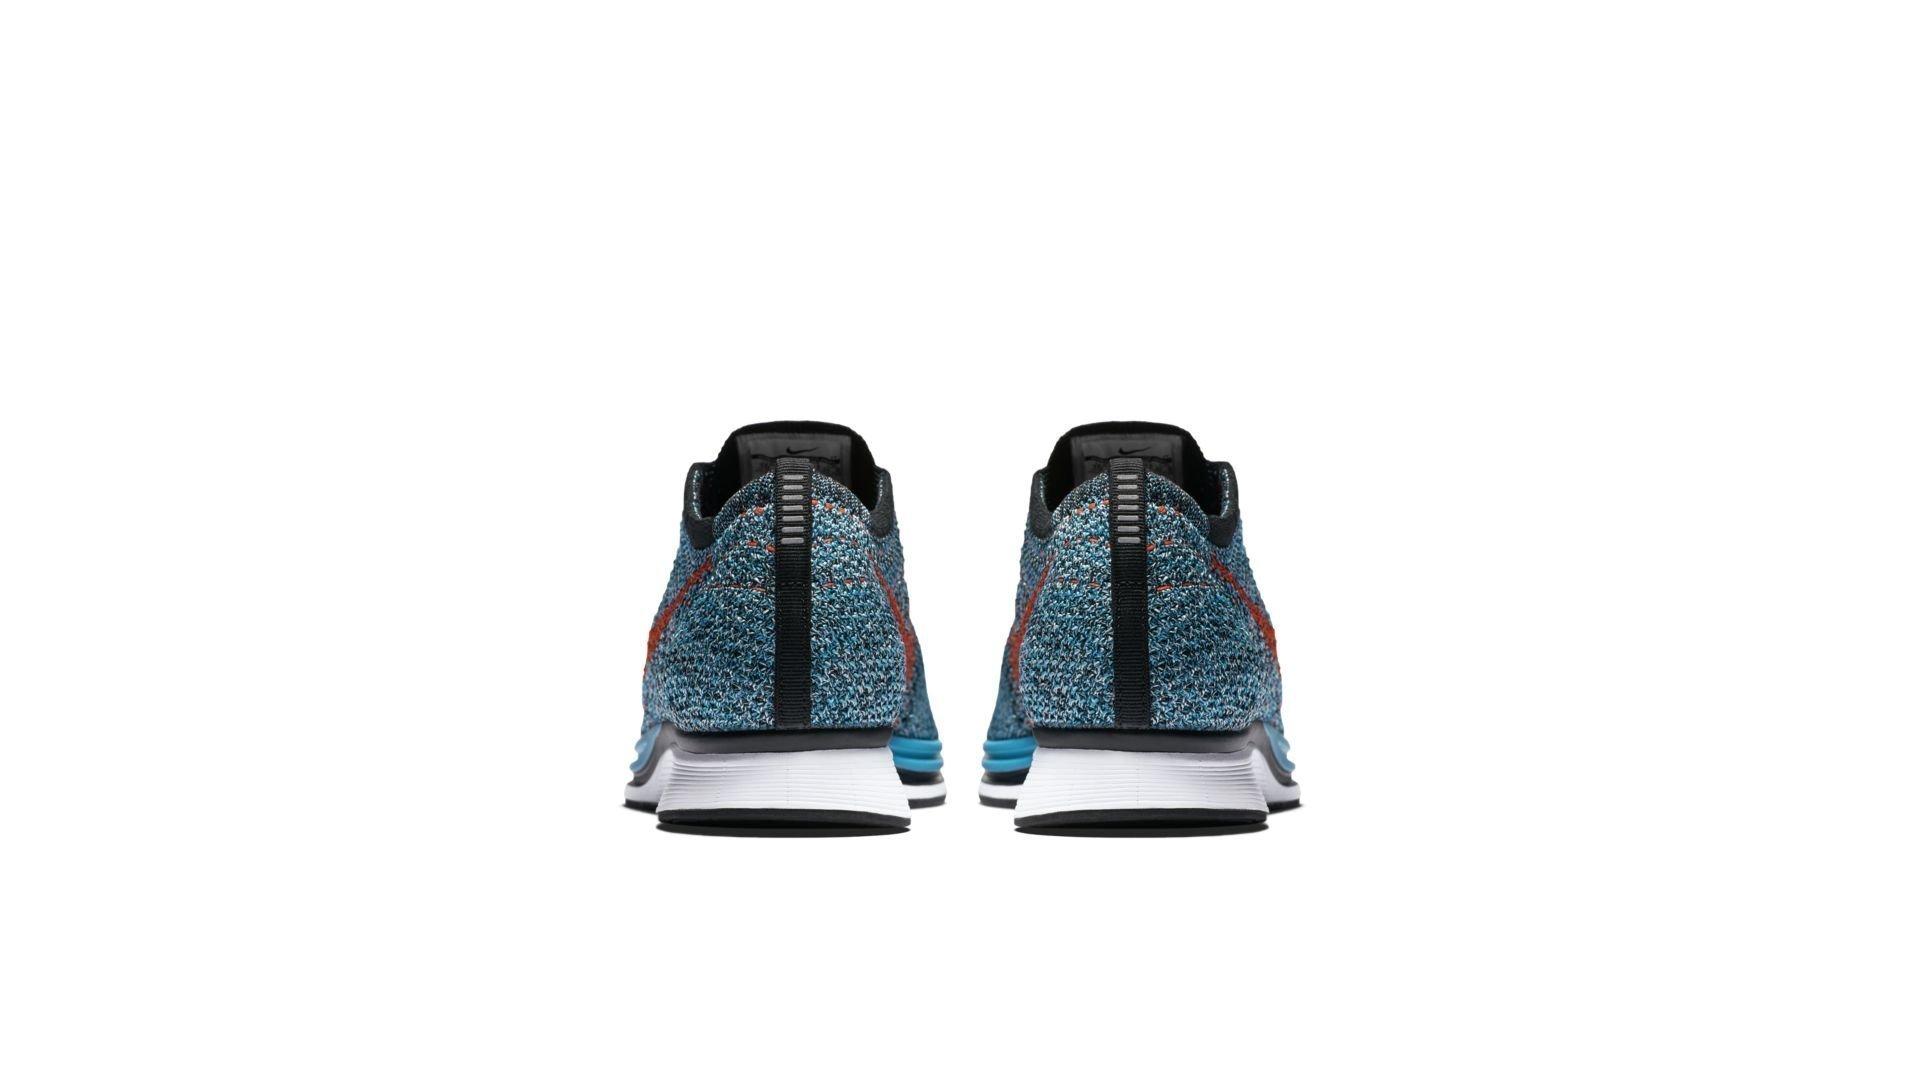 Nike Flyknit Racer Neo Turquoise (526628-404)